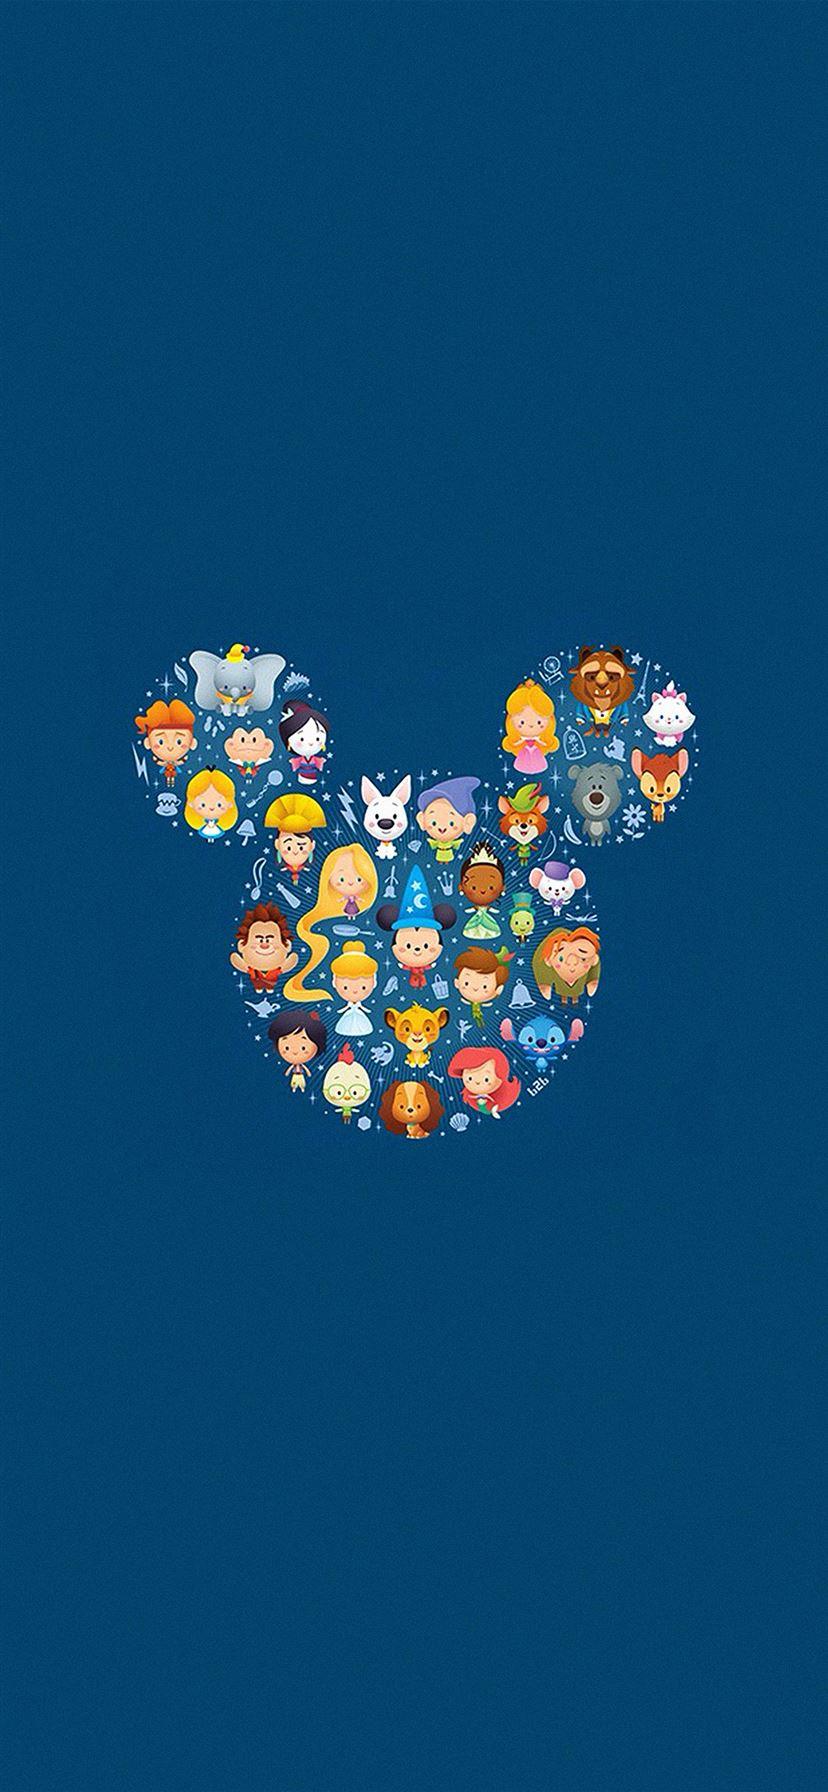 Disney Art Character Cute Iphone 11 Wallpapers Free Download